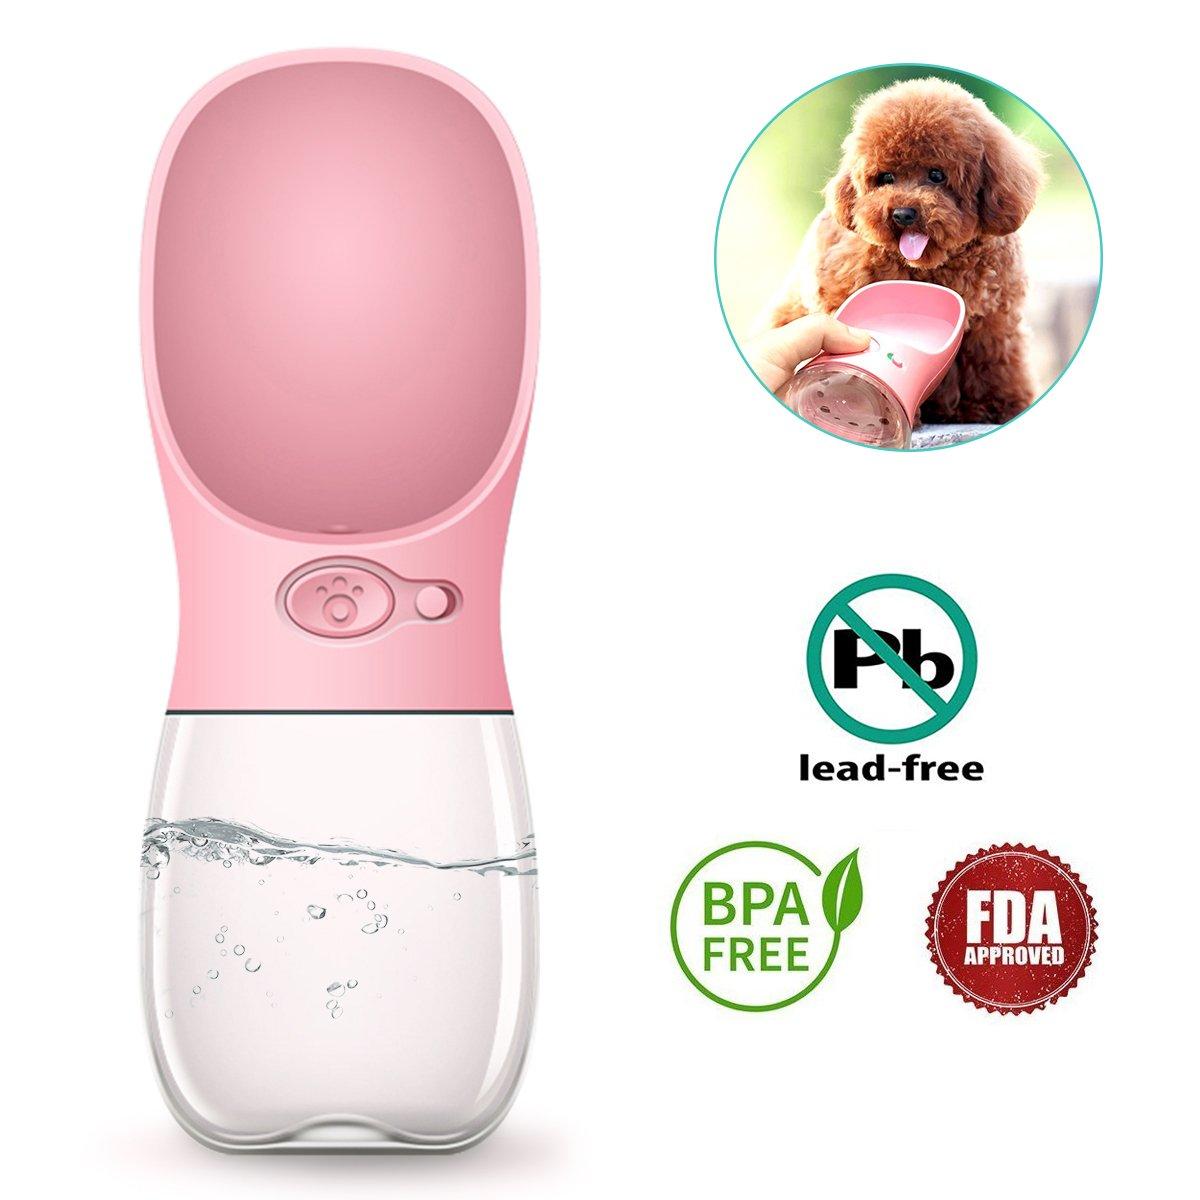 Tabpole Dog Water Bottle, Portable Pet Cat Dog Water Dispenser Antibacterial Food Grade Leak Proof Water Bowl Outdoor Travel Drinking Cup - BPA Free, 350ml Big Trough (Pink)